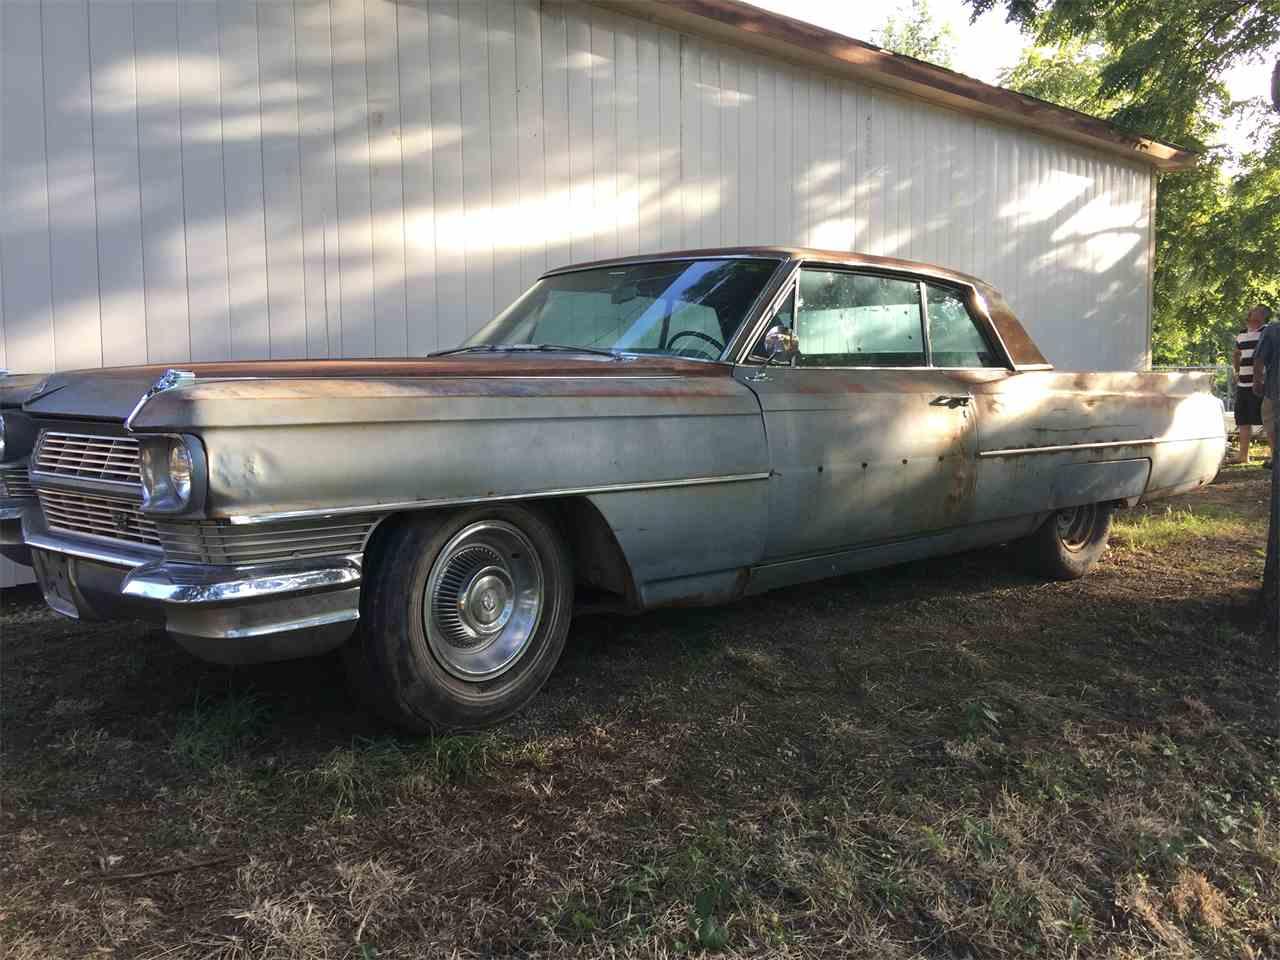 1964 Cadillac Coupe DeVille for Sale | ClassicCars.com | CC-1001744